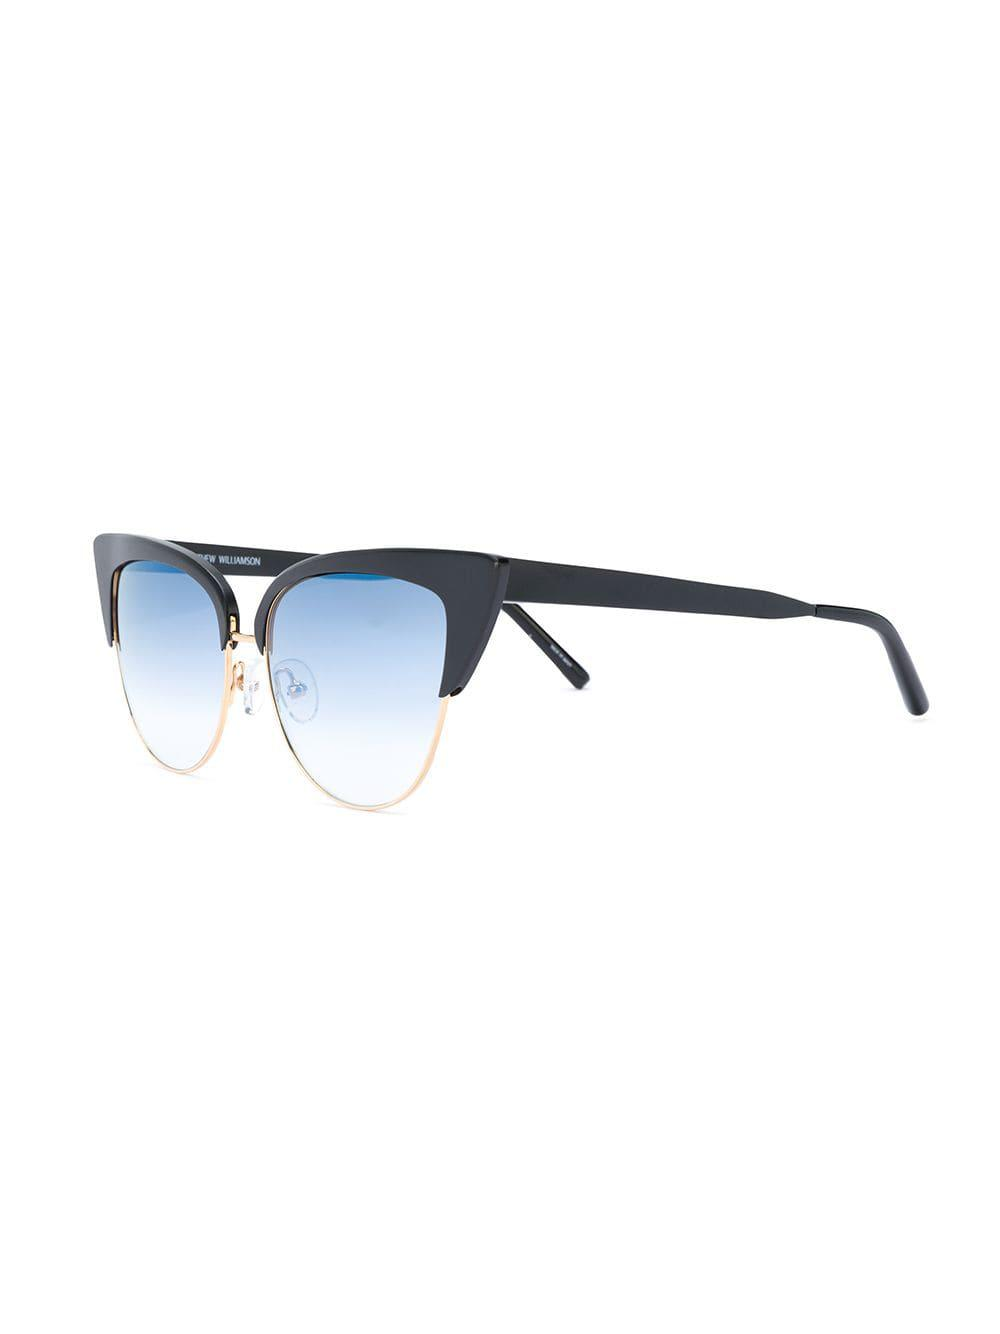 Matthew Williamson exaggerated Cat Eye Sunglasses in Black